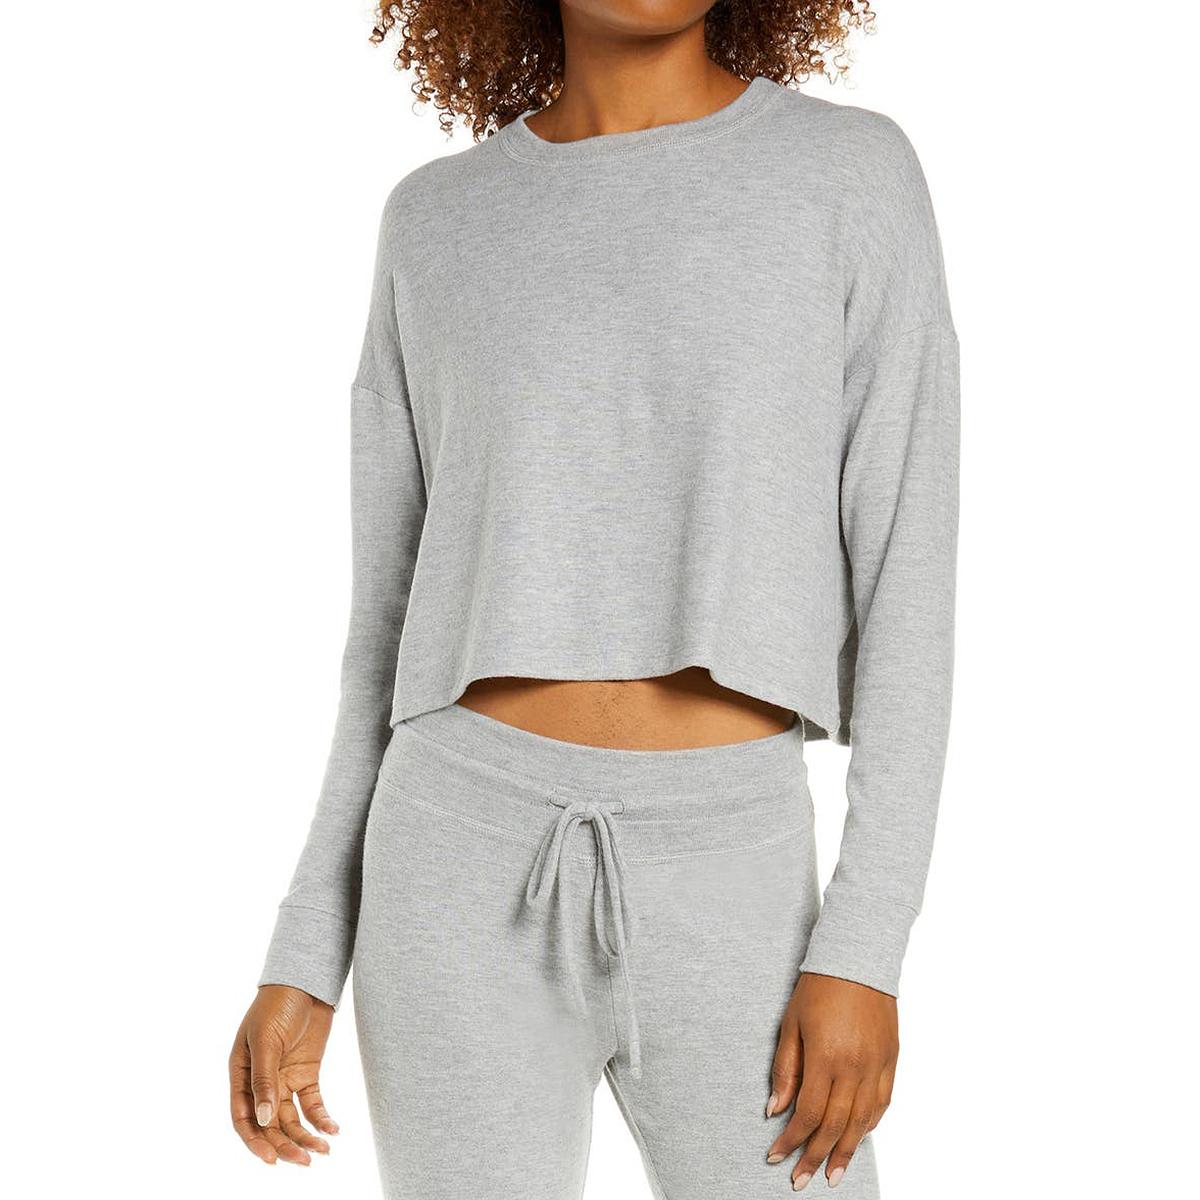 nordstrom-anniversary-sale-beyond-yoga-sweatshirt